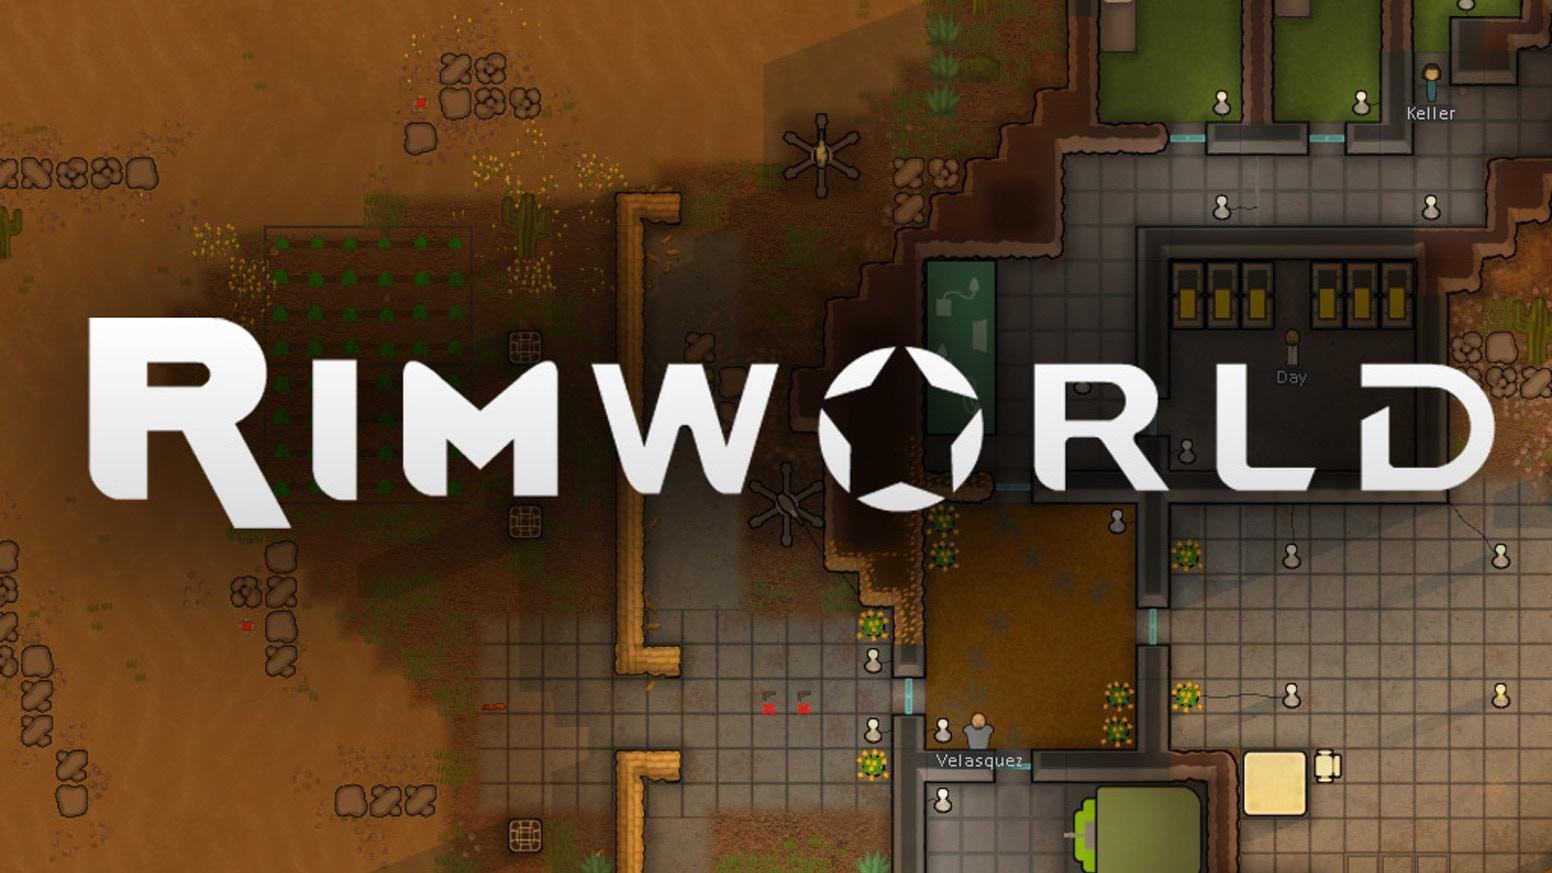 RimWorld PC Download free full game for windows